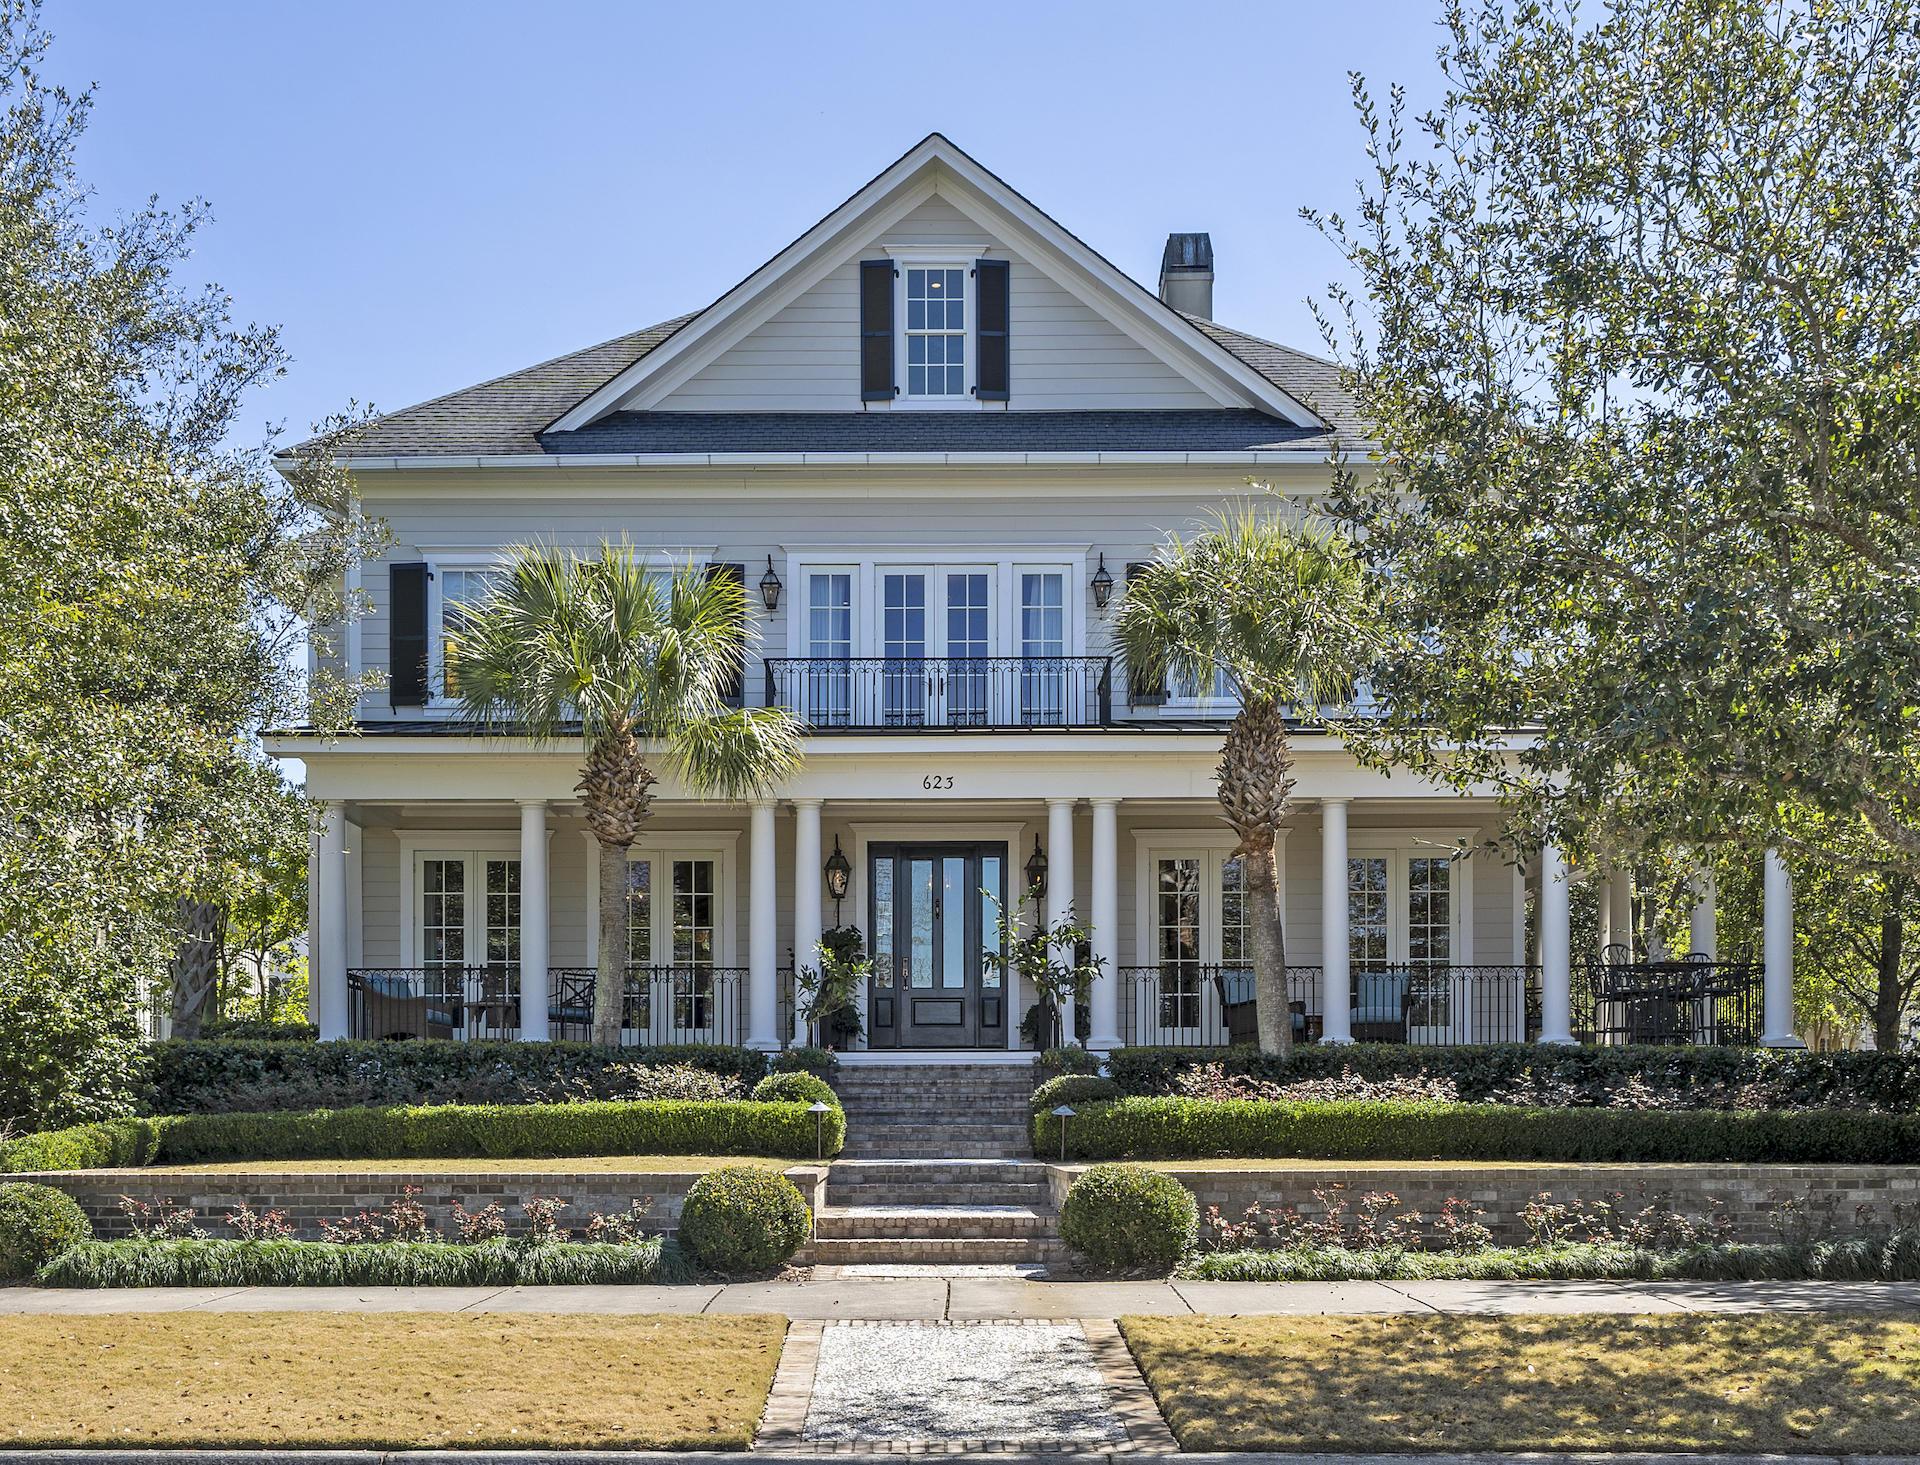 Daniel Island Homes For Sale - 623 Island Park, Charleston, SC - 63